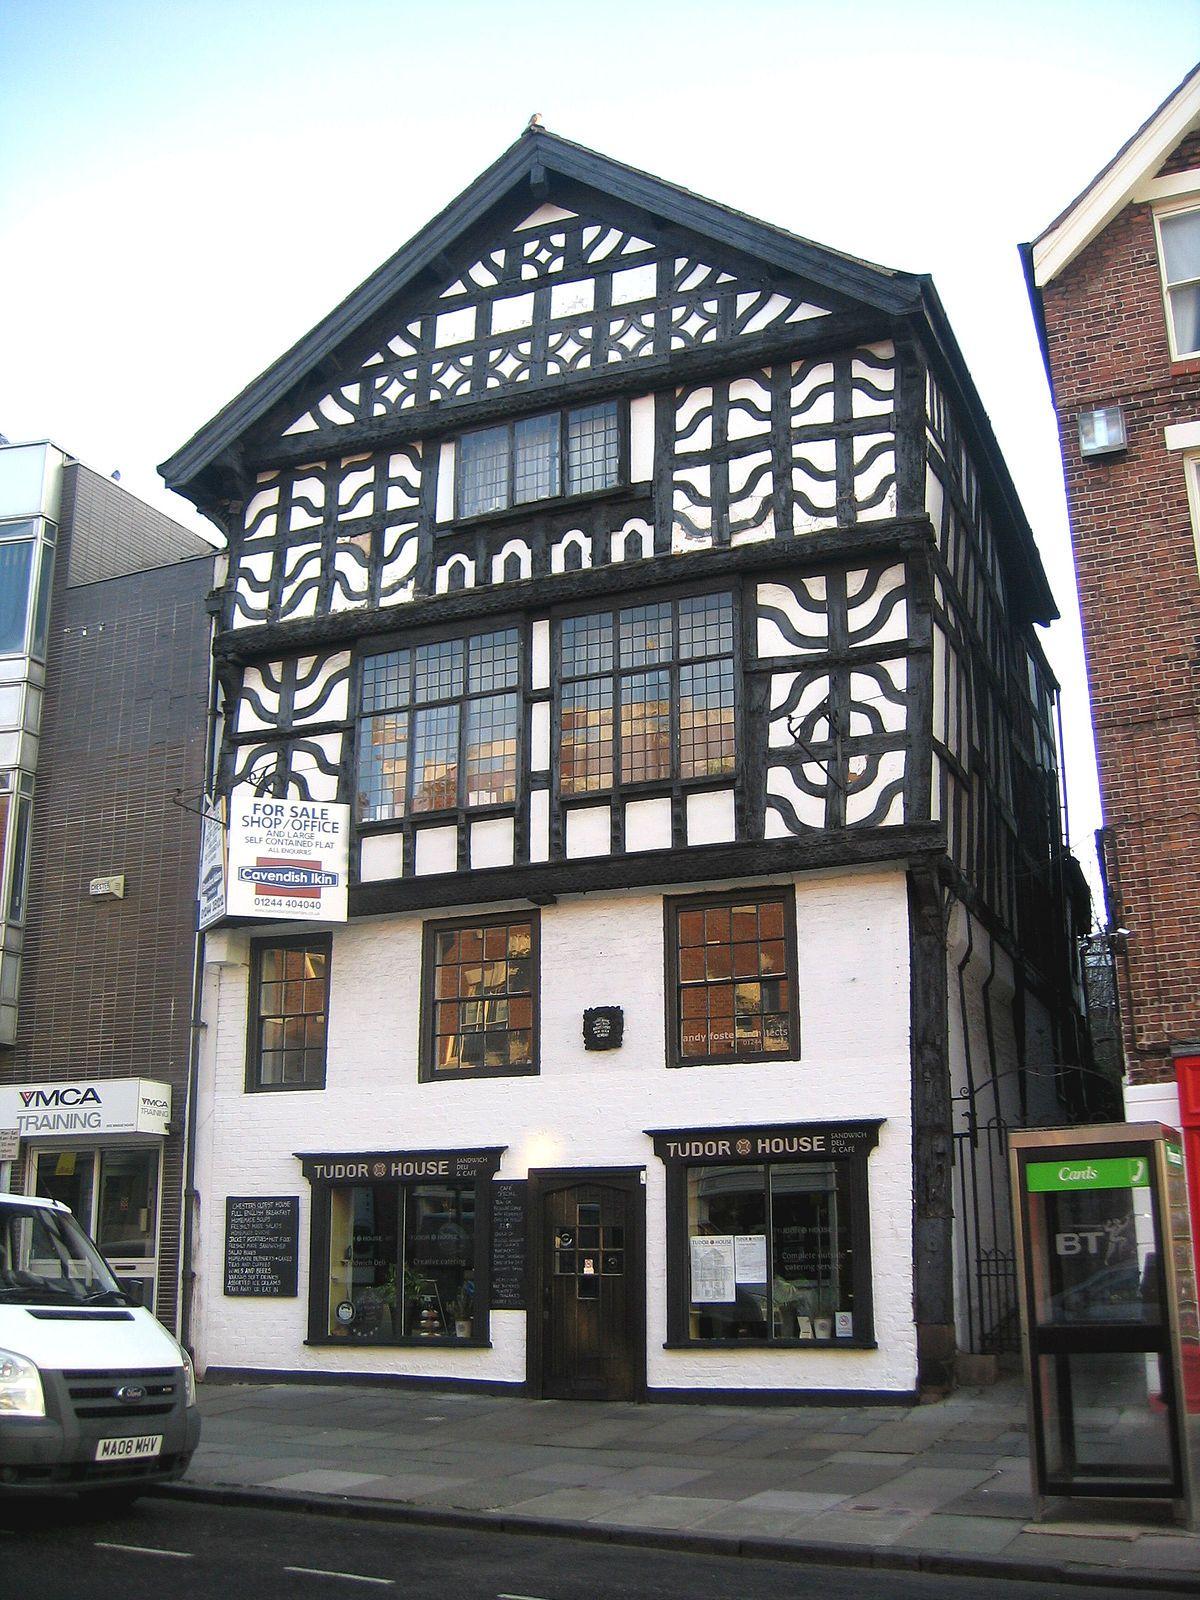 Tudor building photo